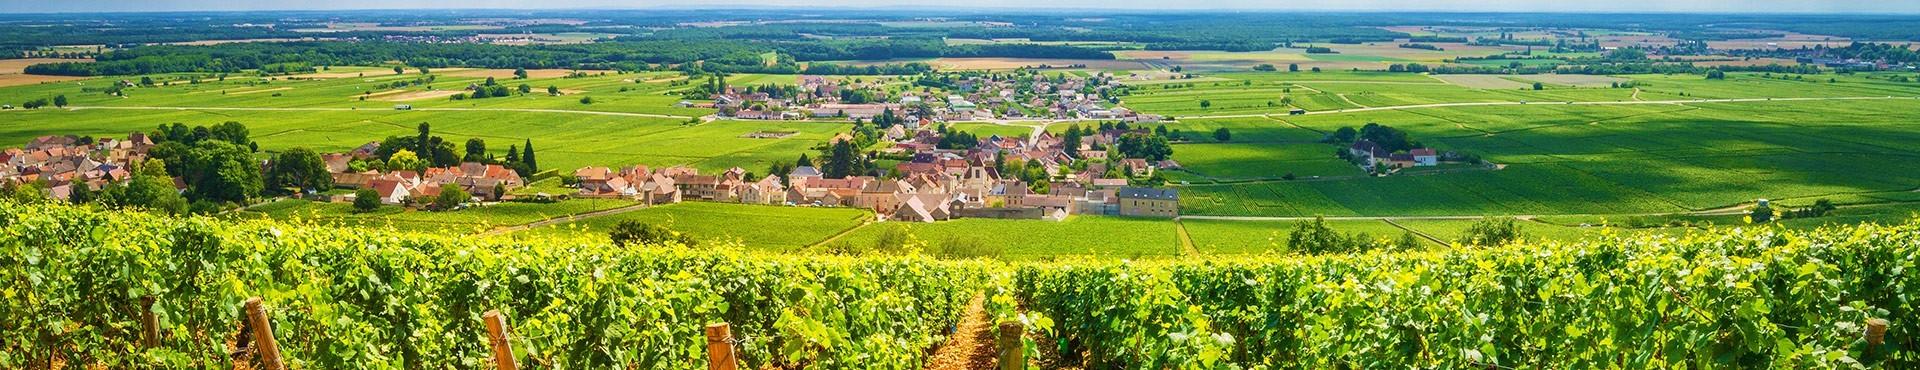 Nos grands vins abordables - OnWine